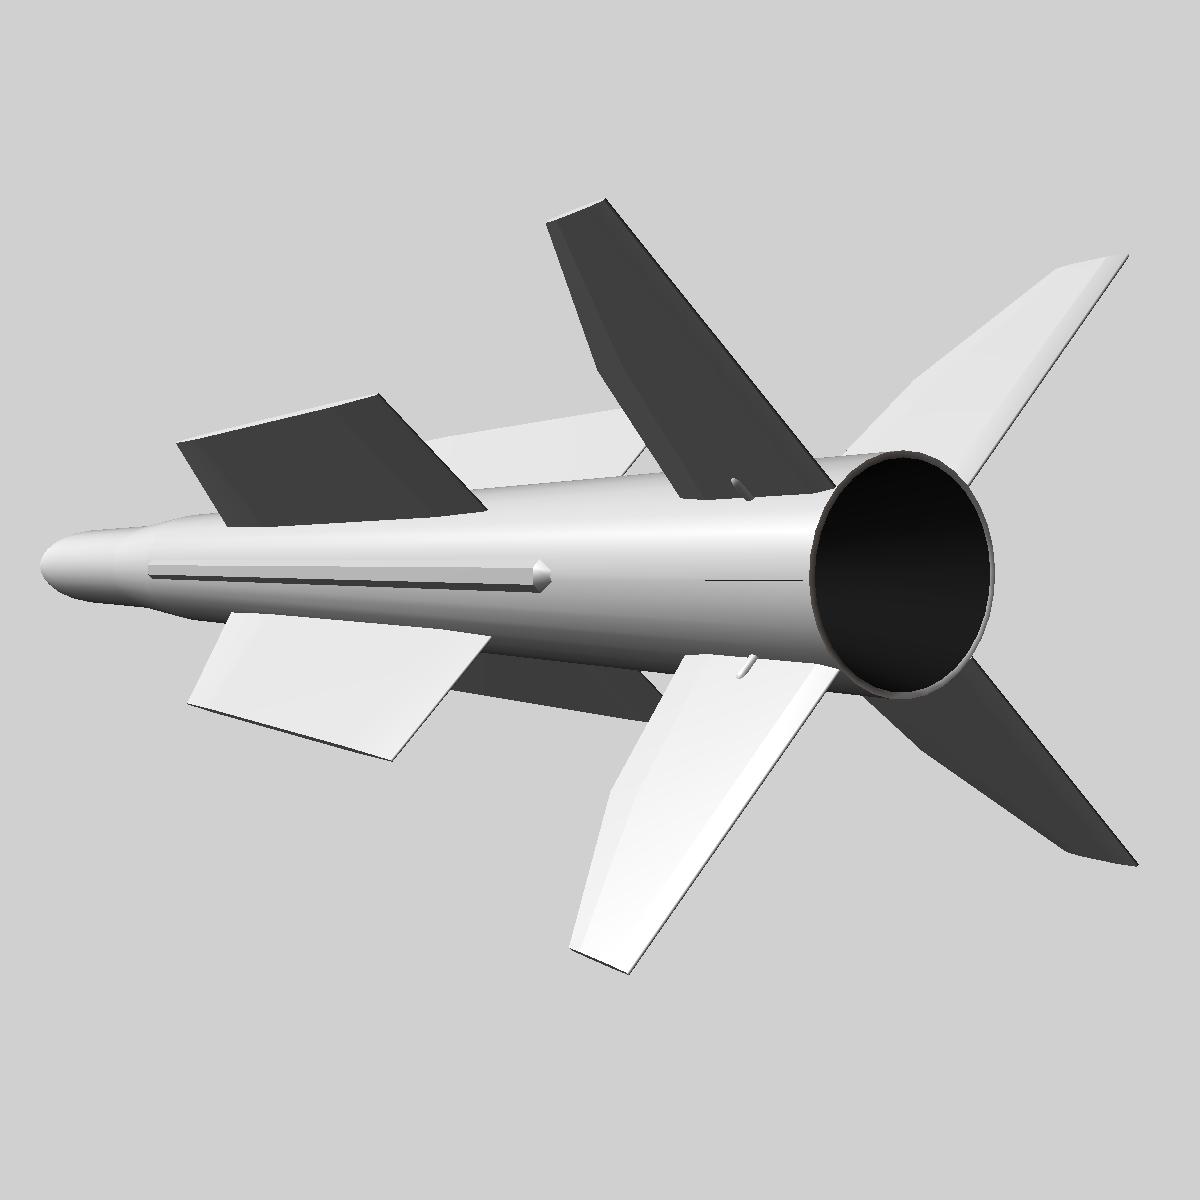 iranian taer-2 eldflaug 3d líkan 3ds dxf x þorskskoða obj 149246